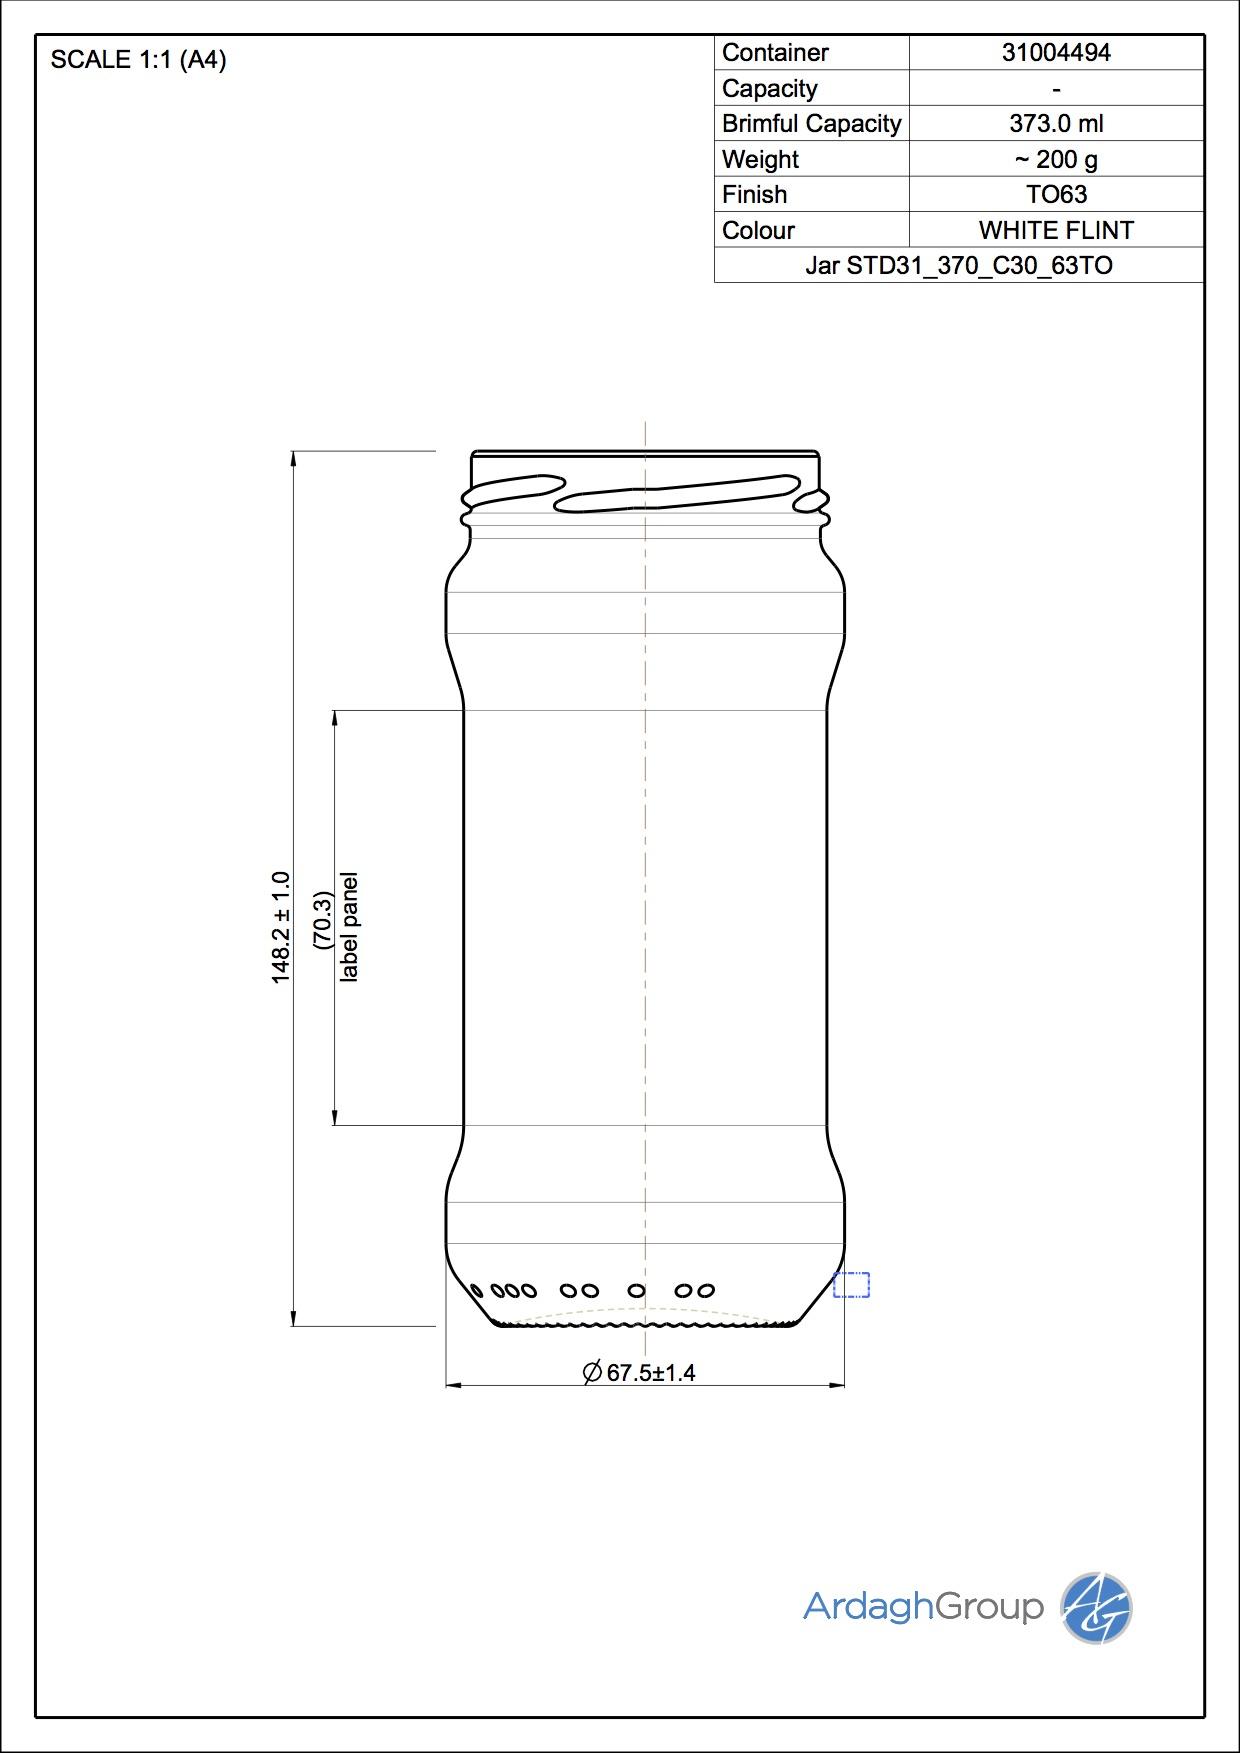 Jar STD31 375 C30 63TO